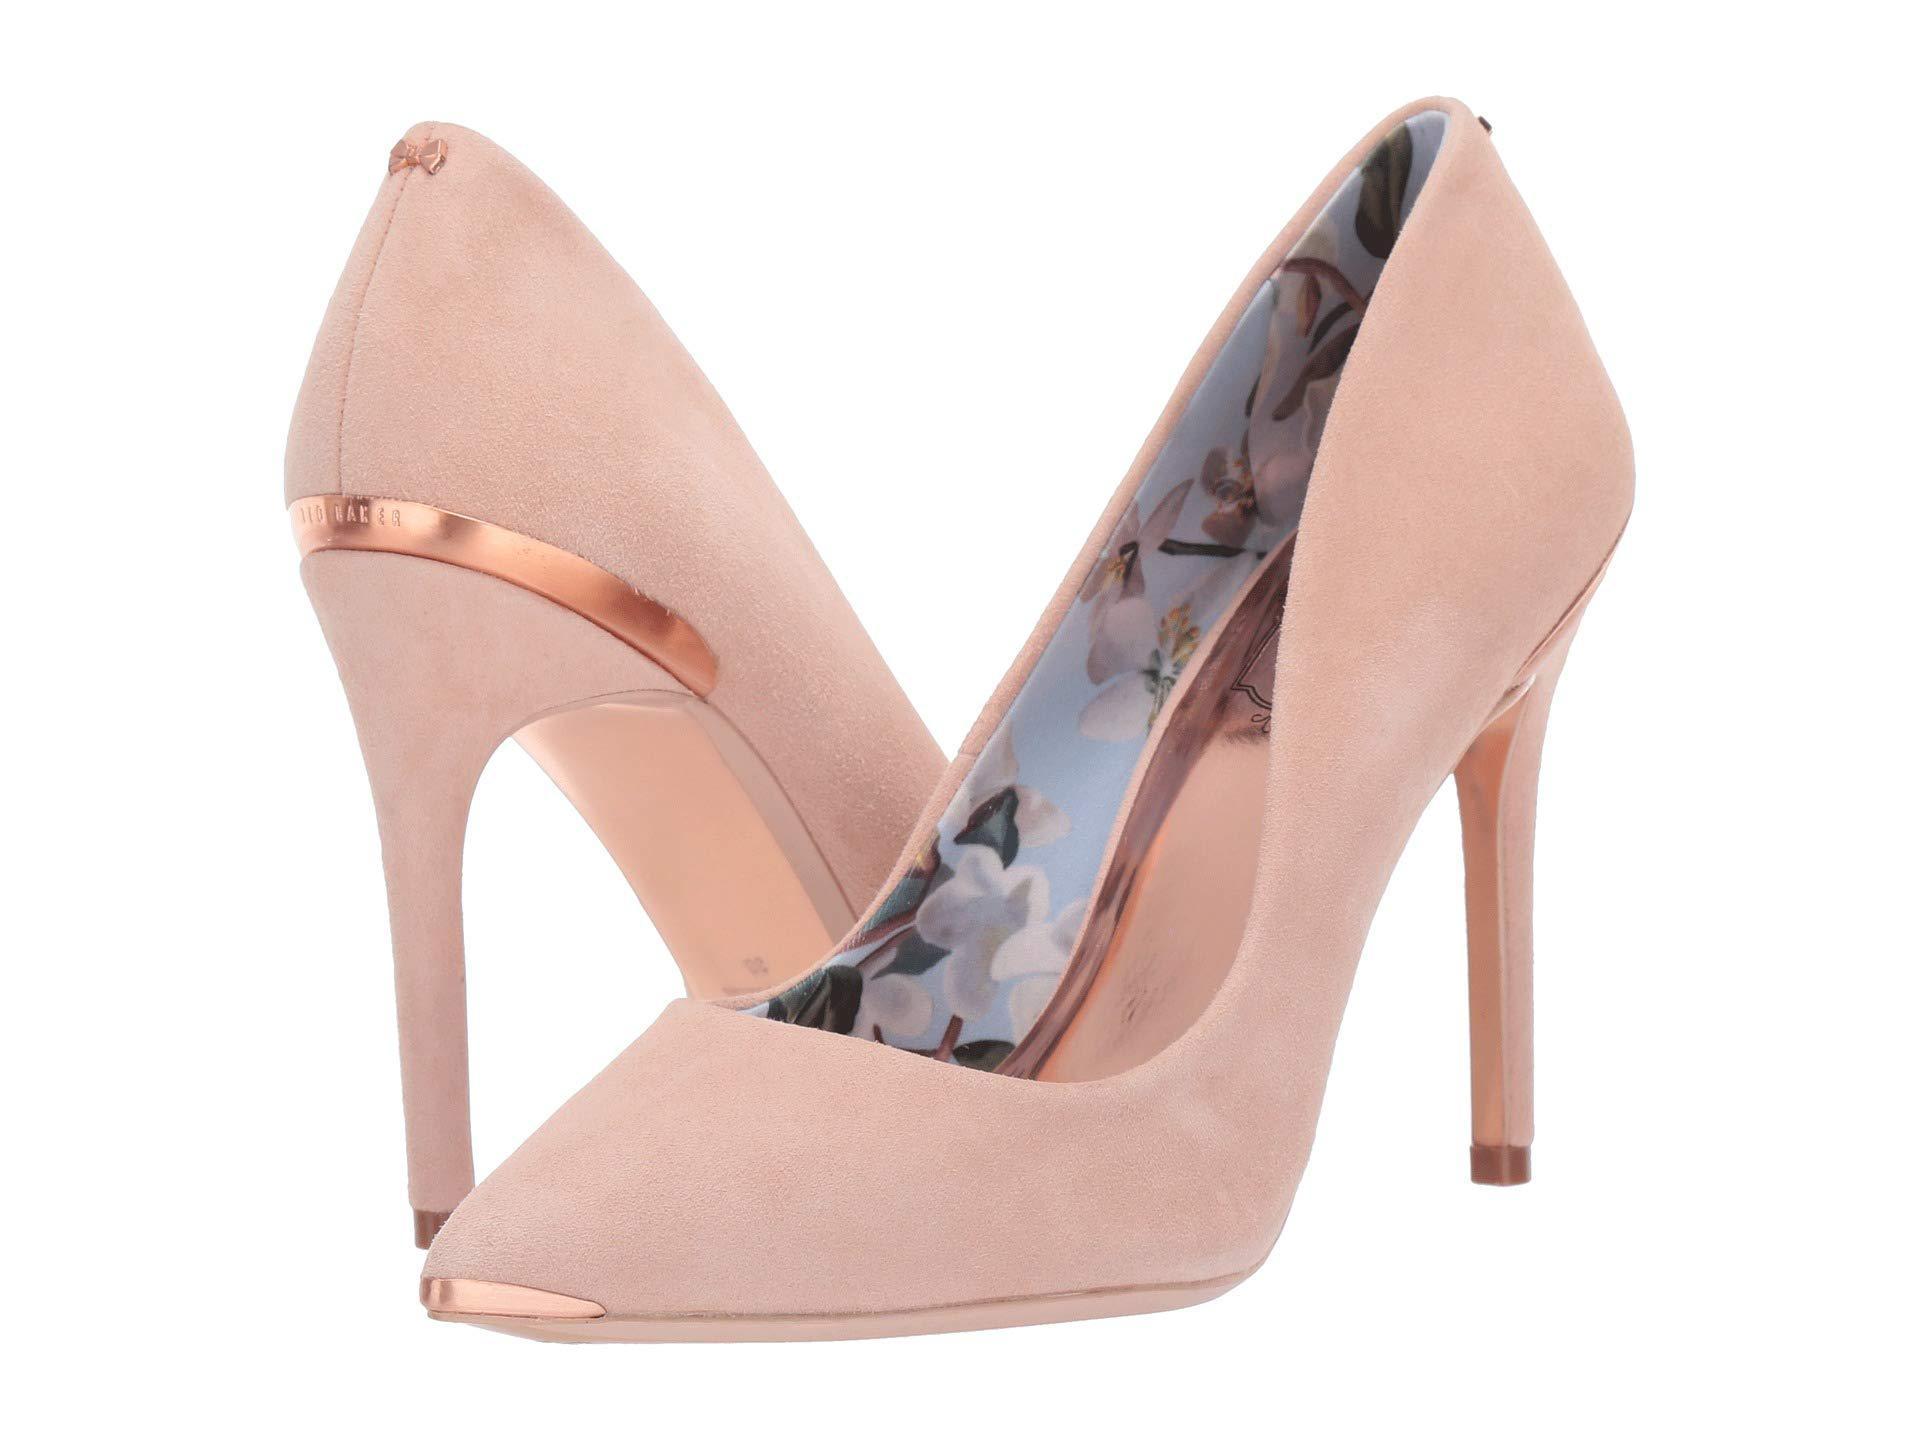 ec68c541c5a Lyst - Ted Baker Kawaa (camel) Women s Shoes in Pink